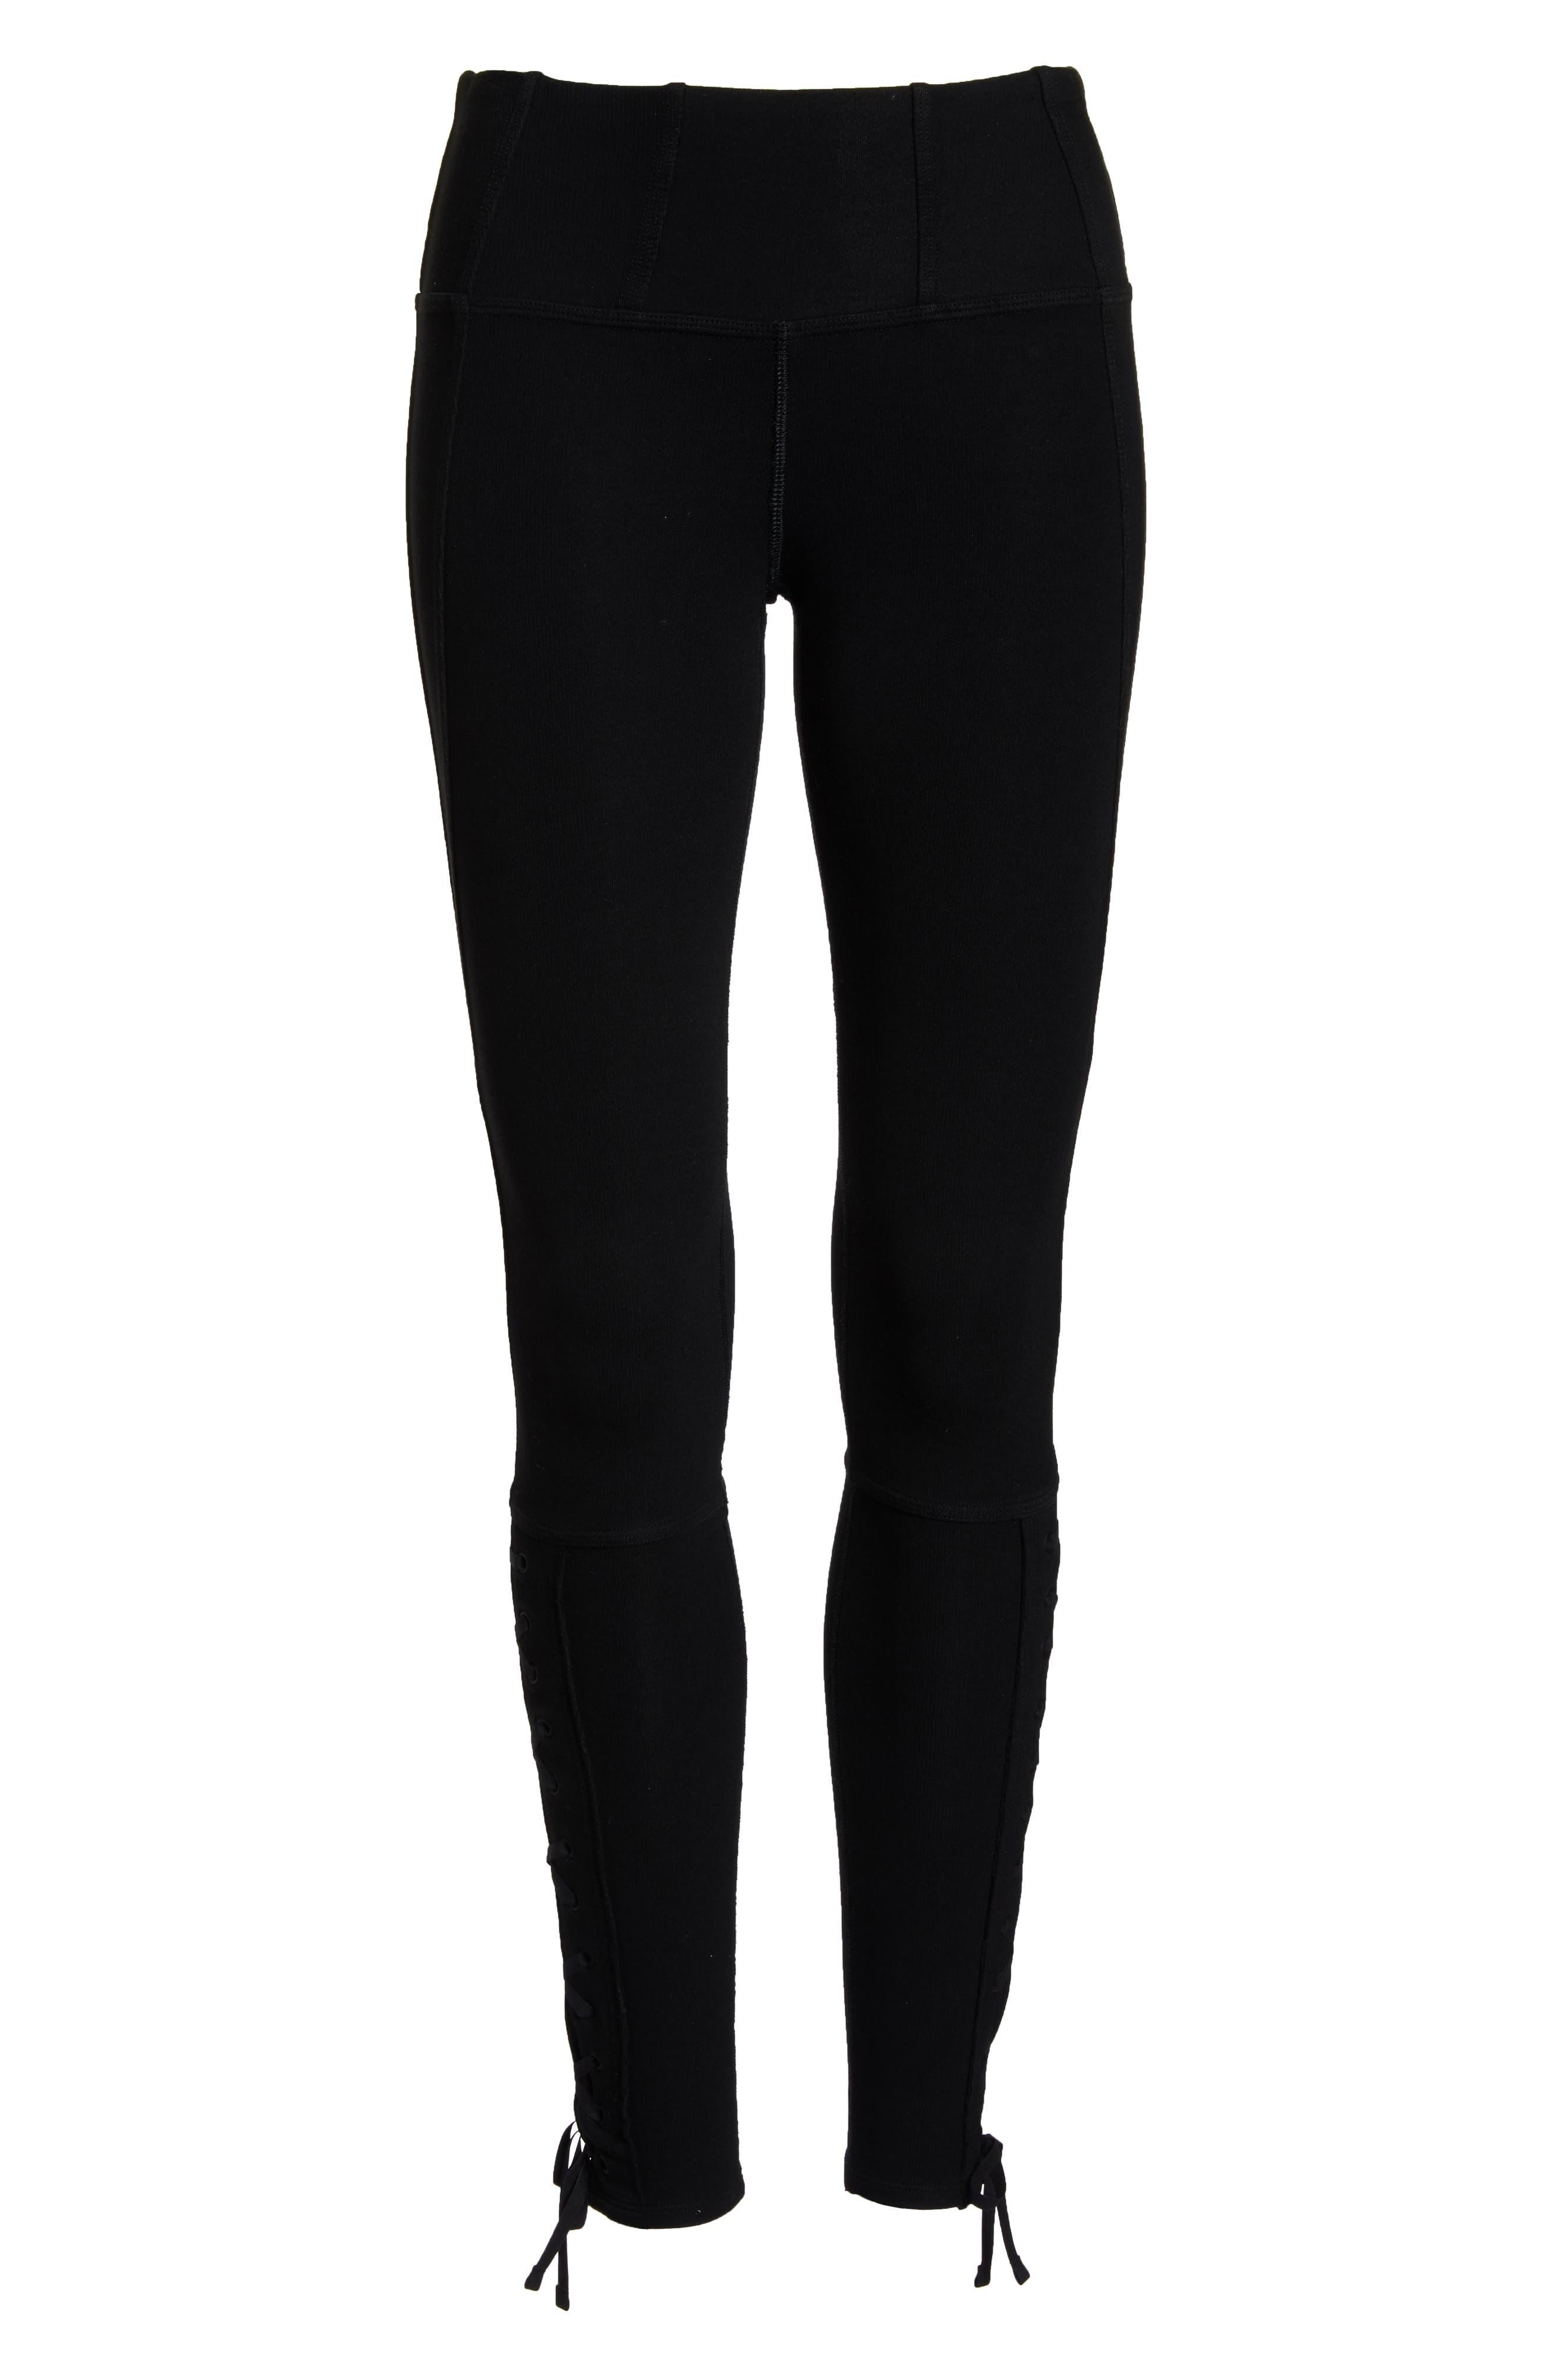 FP Movement Pixi Lace-Up Leggings,                             Alternate thumbnail 7, color,                             BLACK